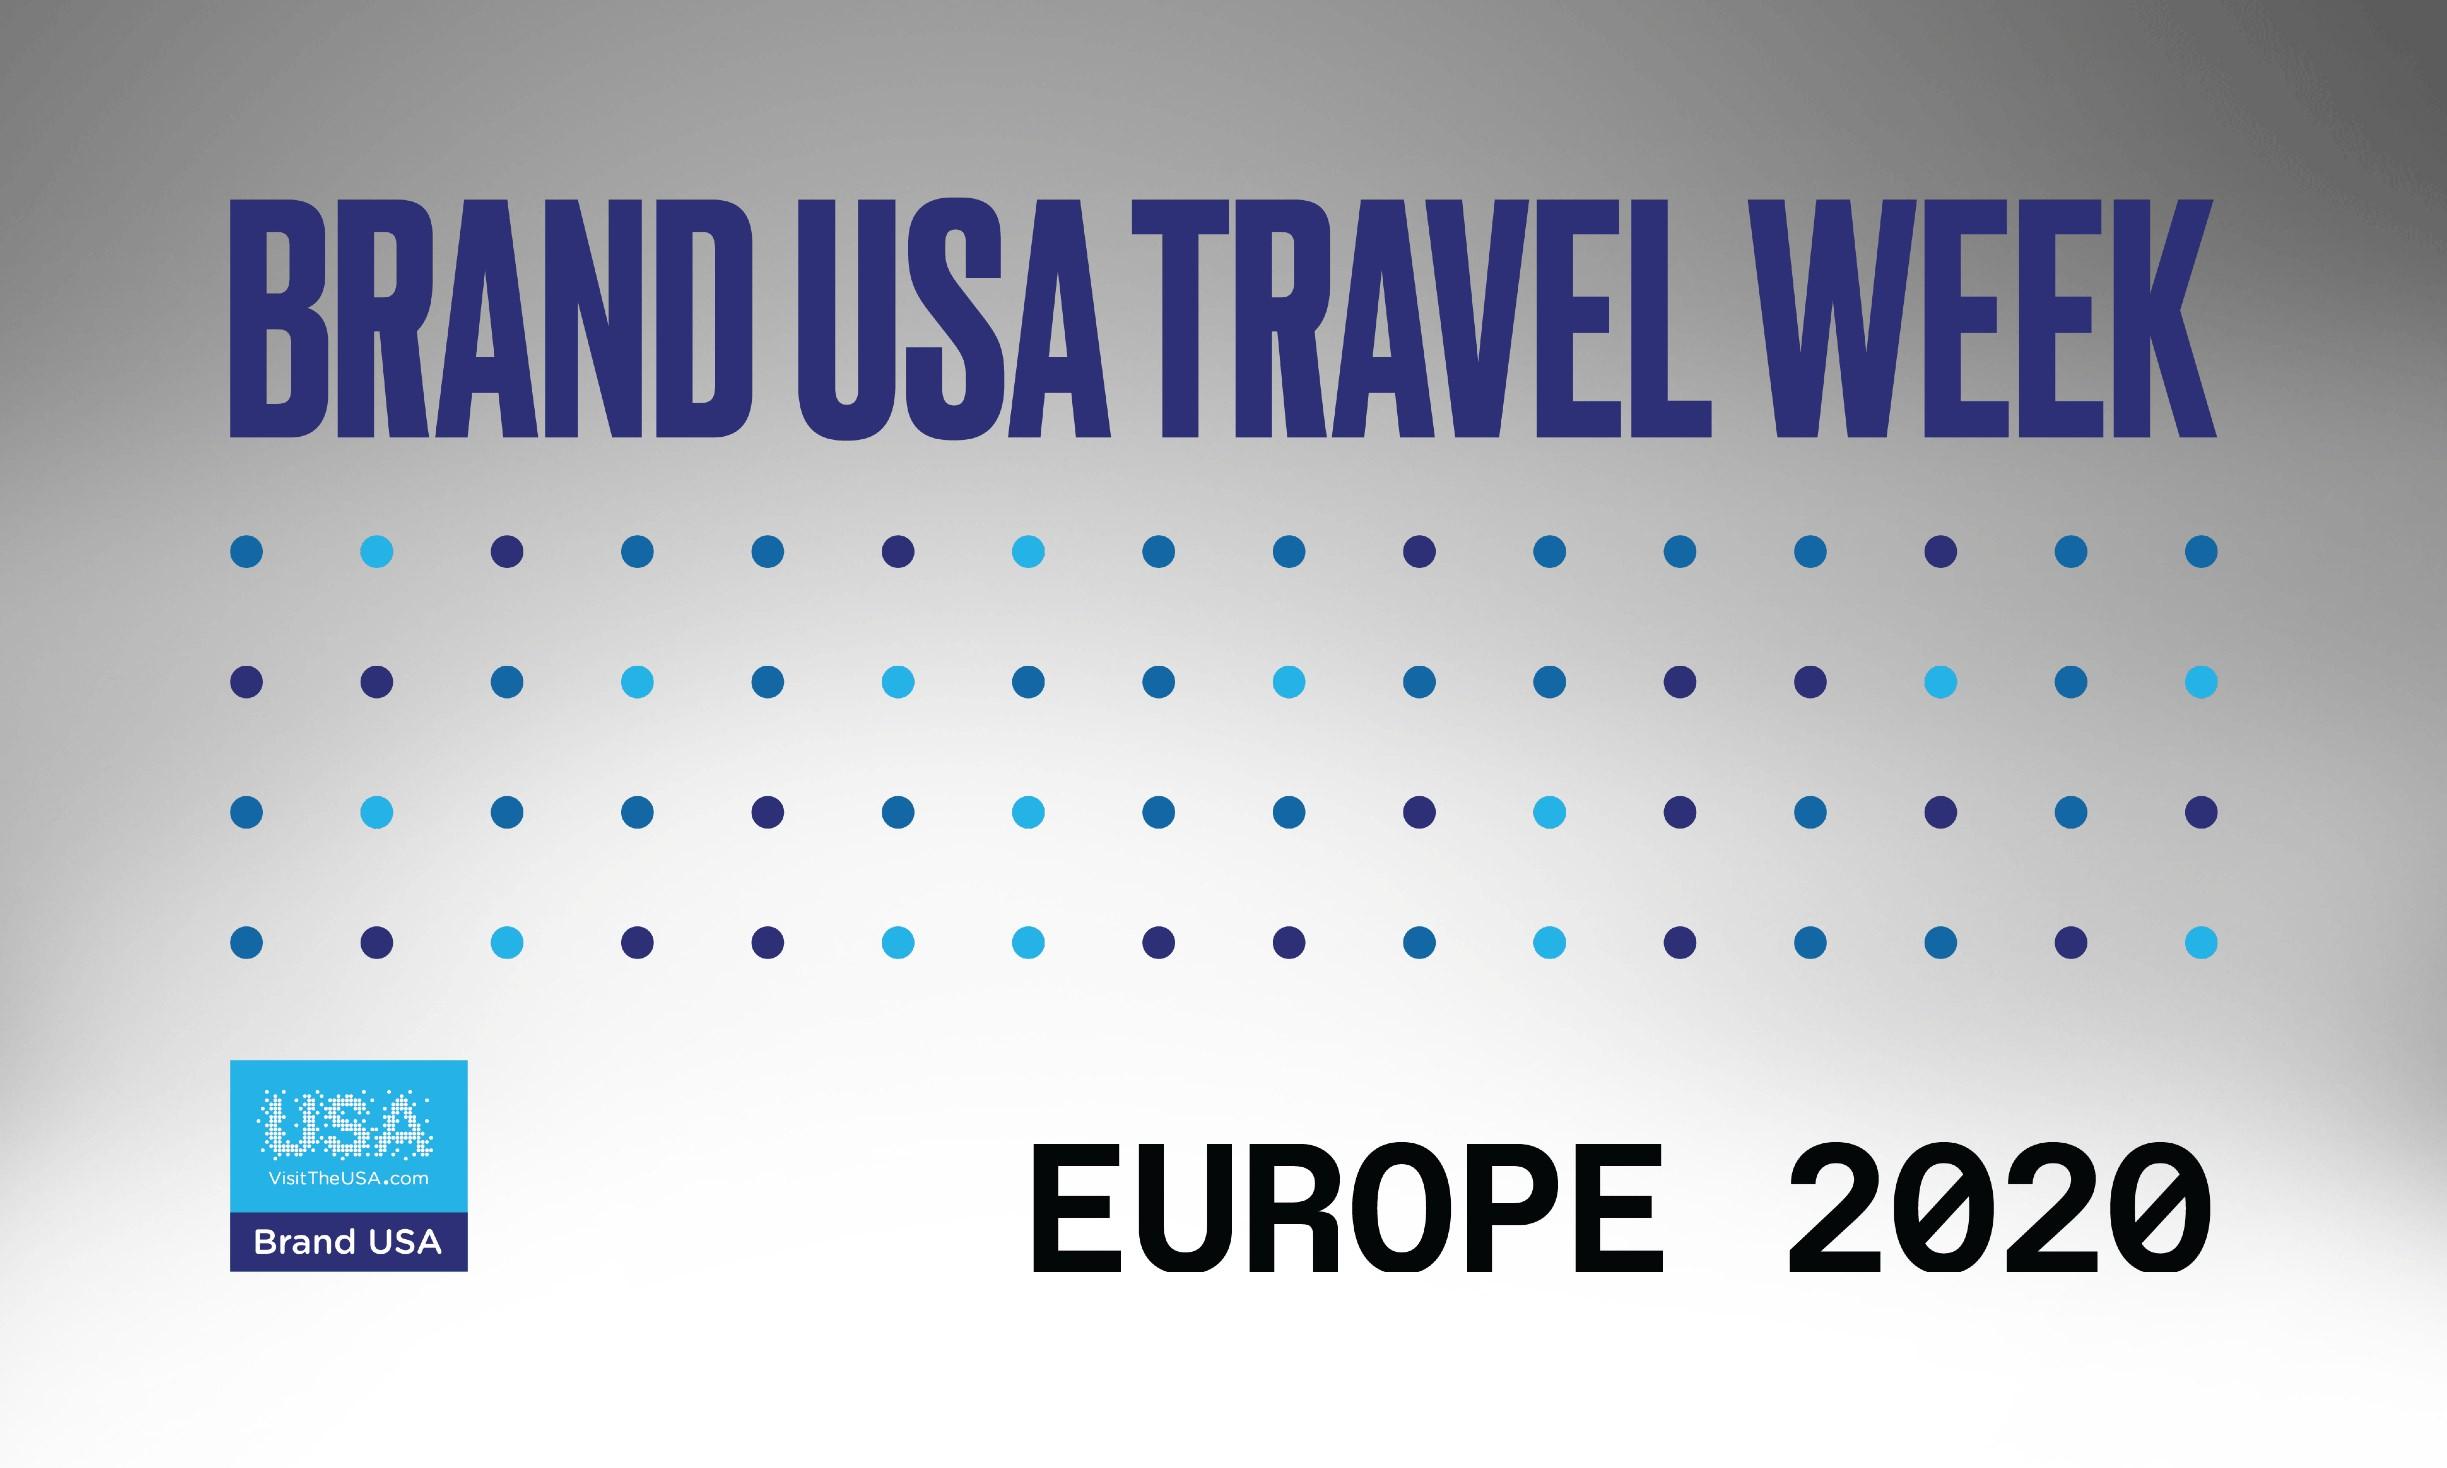 Brand USA Travel Week Europe 2020 ya está en marcha